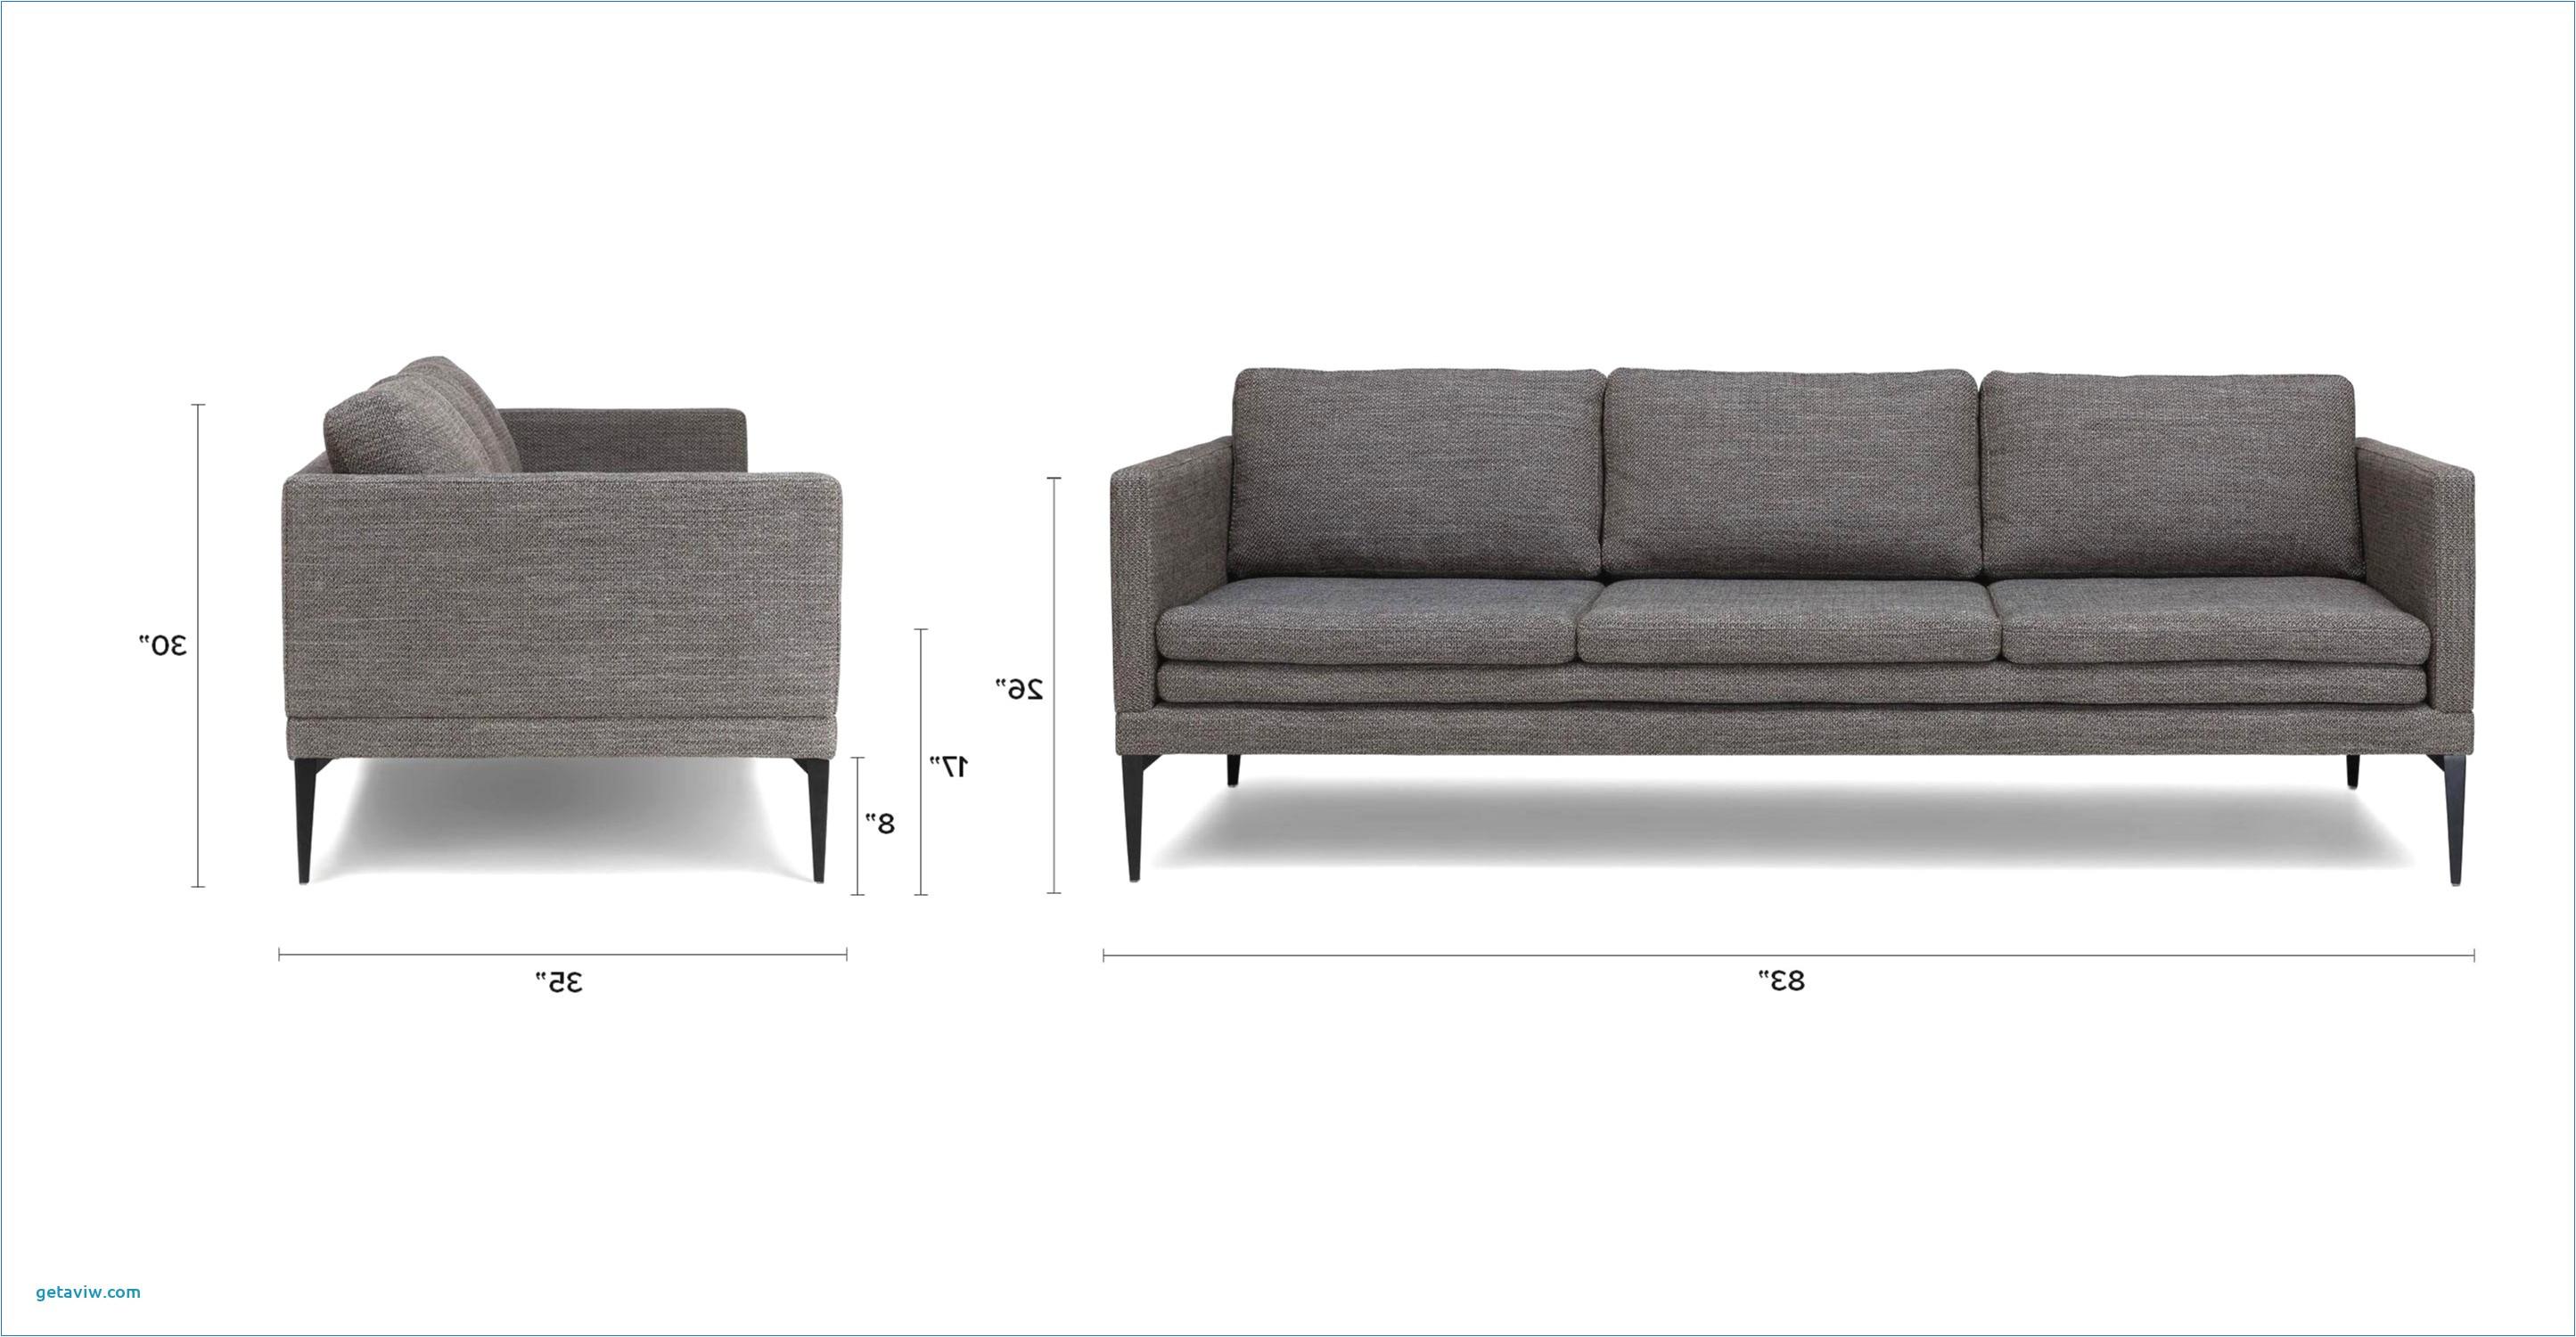 ikea 140 bett inspirierend ikea sofa bett mit 56 beilaufig ikea sofa bett sofa 140 interior